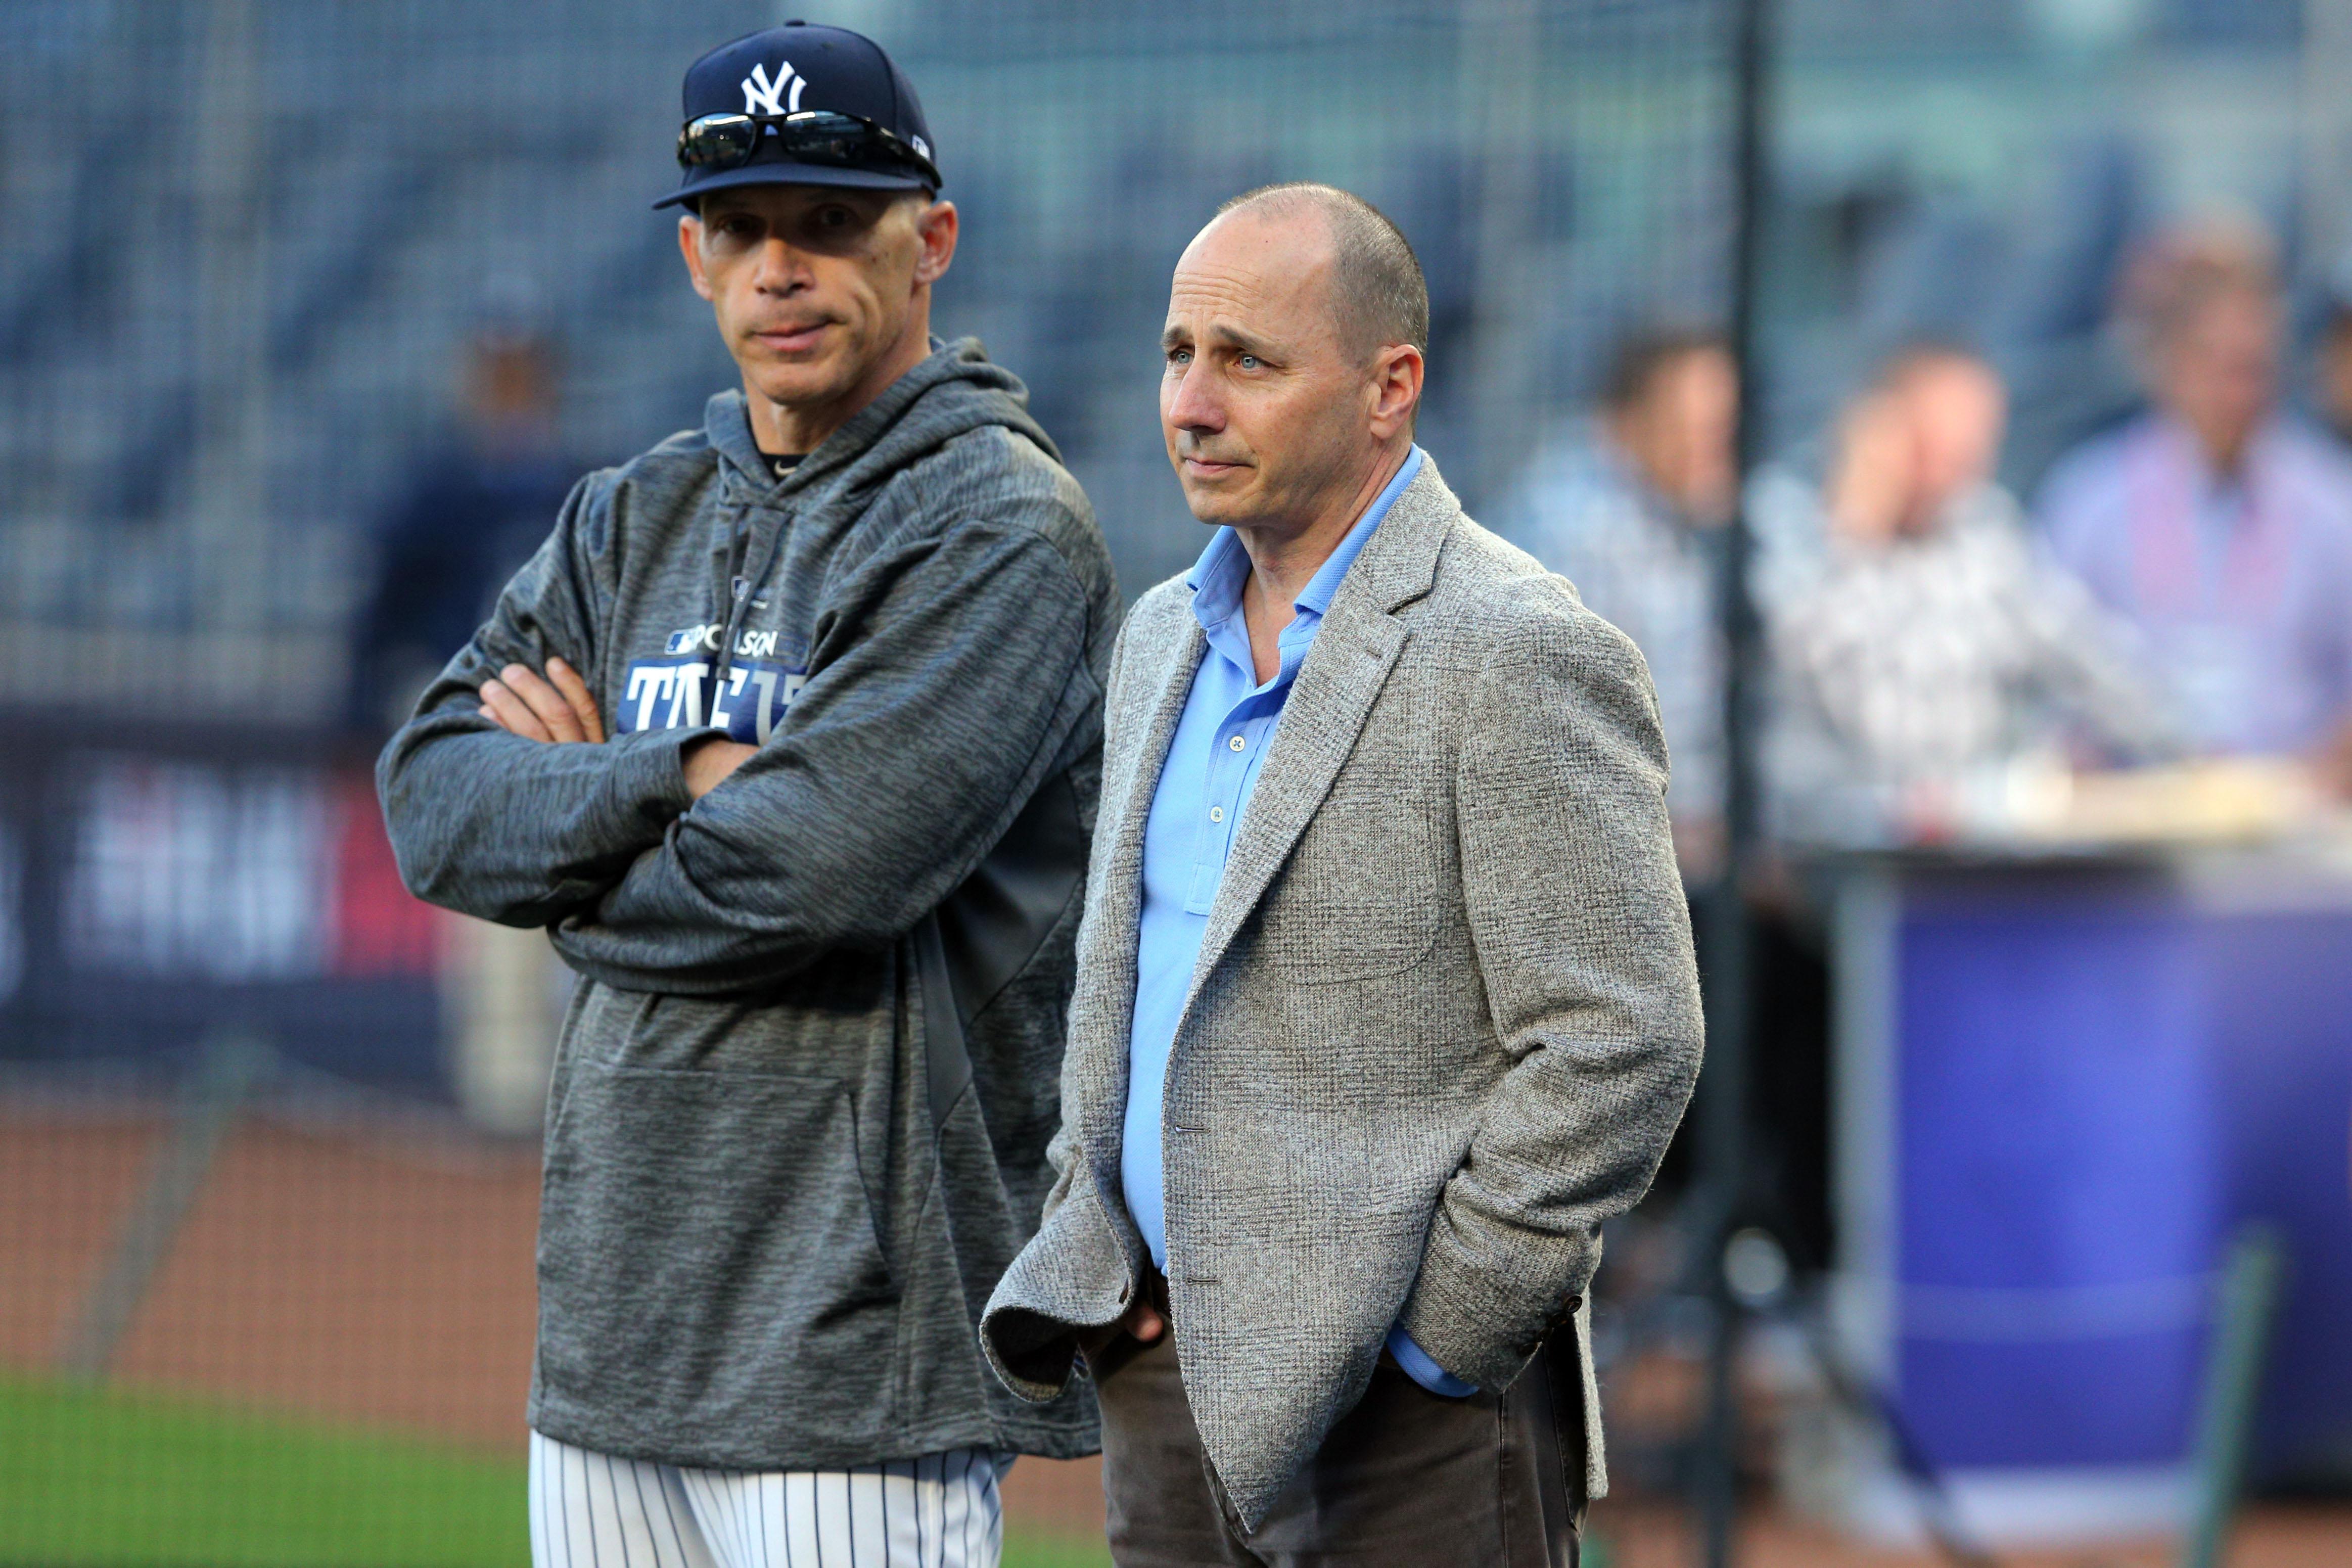 MLB: AL Wildcard-Minnesota Twins at New York Yankees